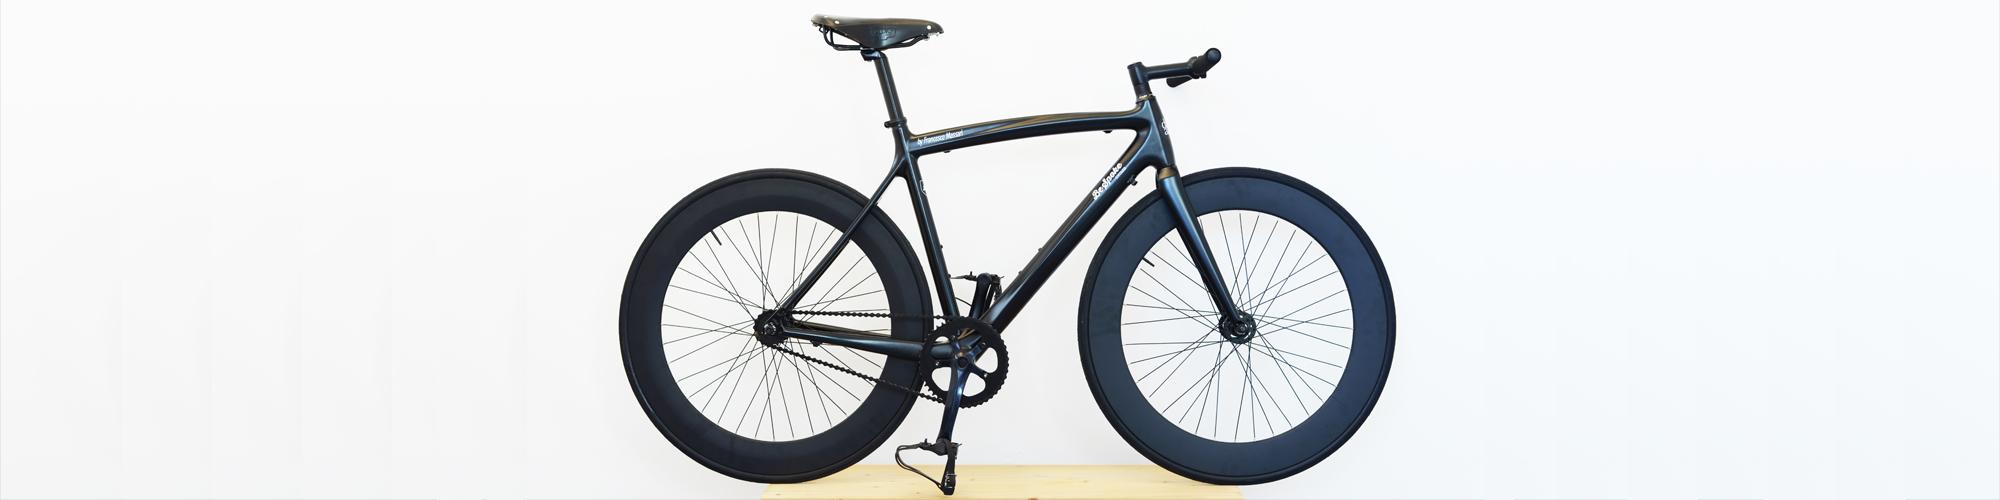 Bespoke-bike2